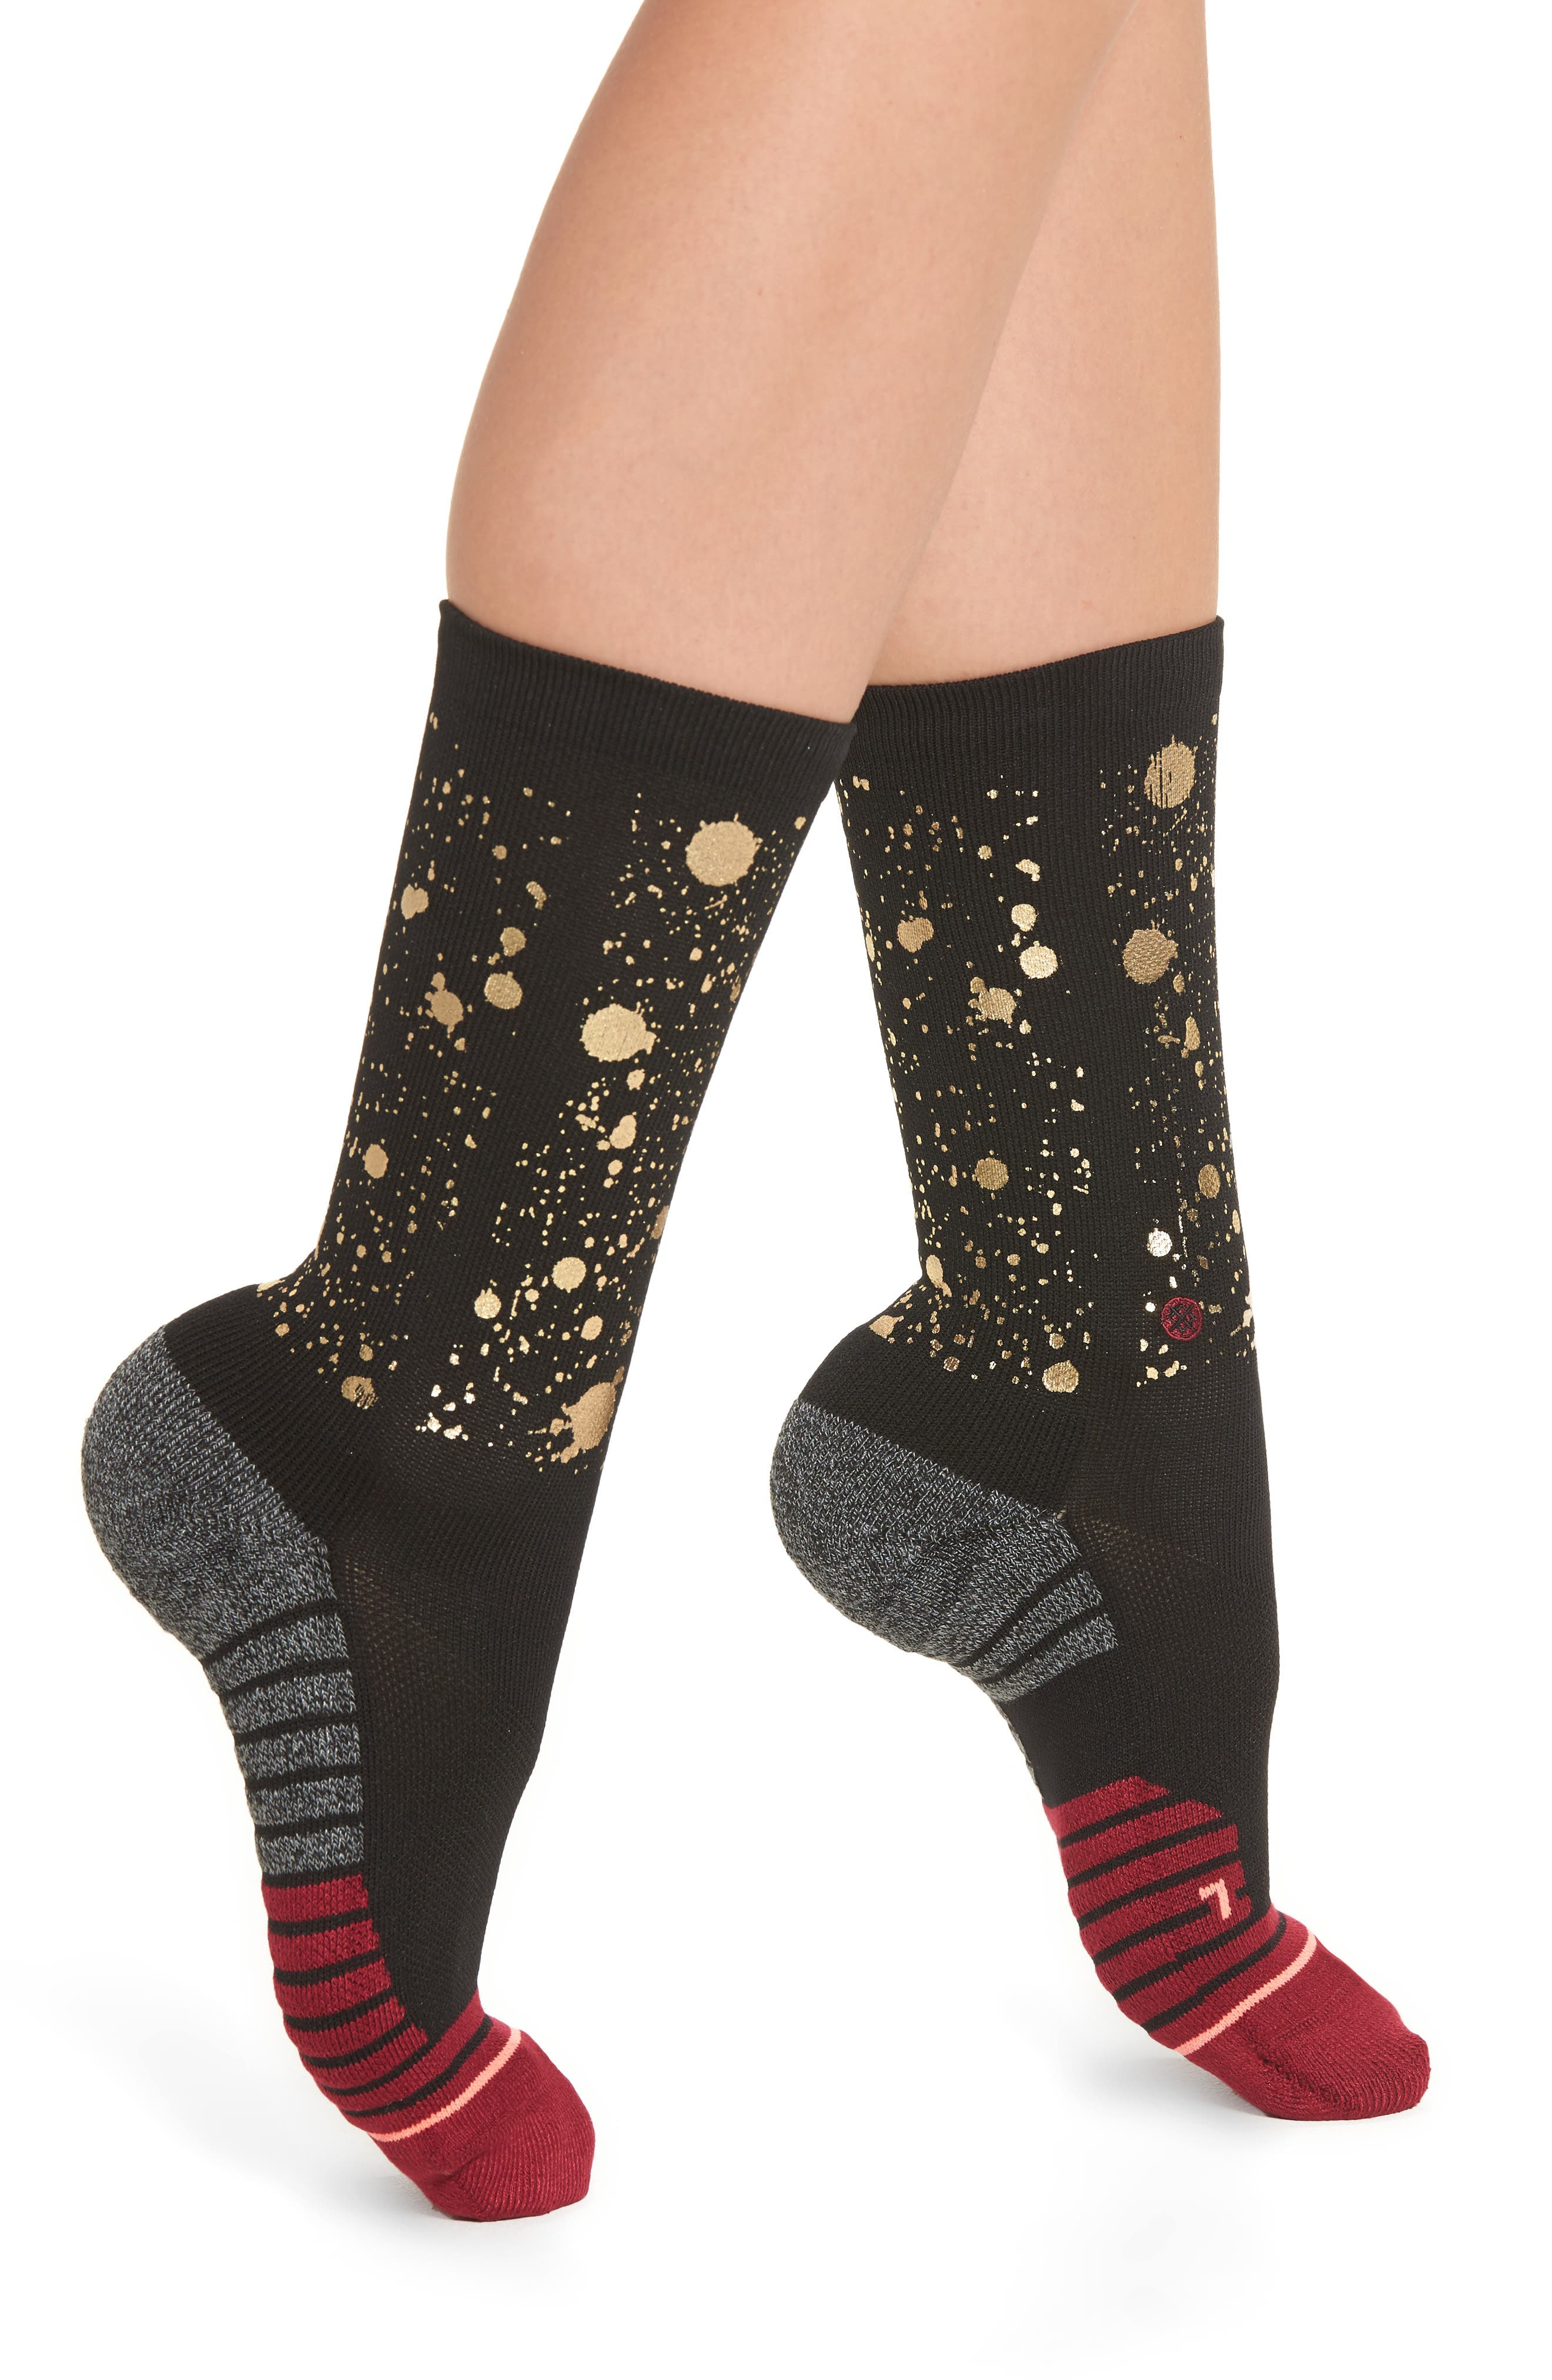 Endorphin Training Socks,                         Main,                         color, 001